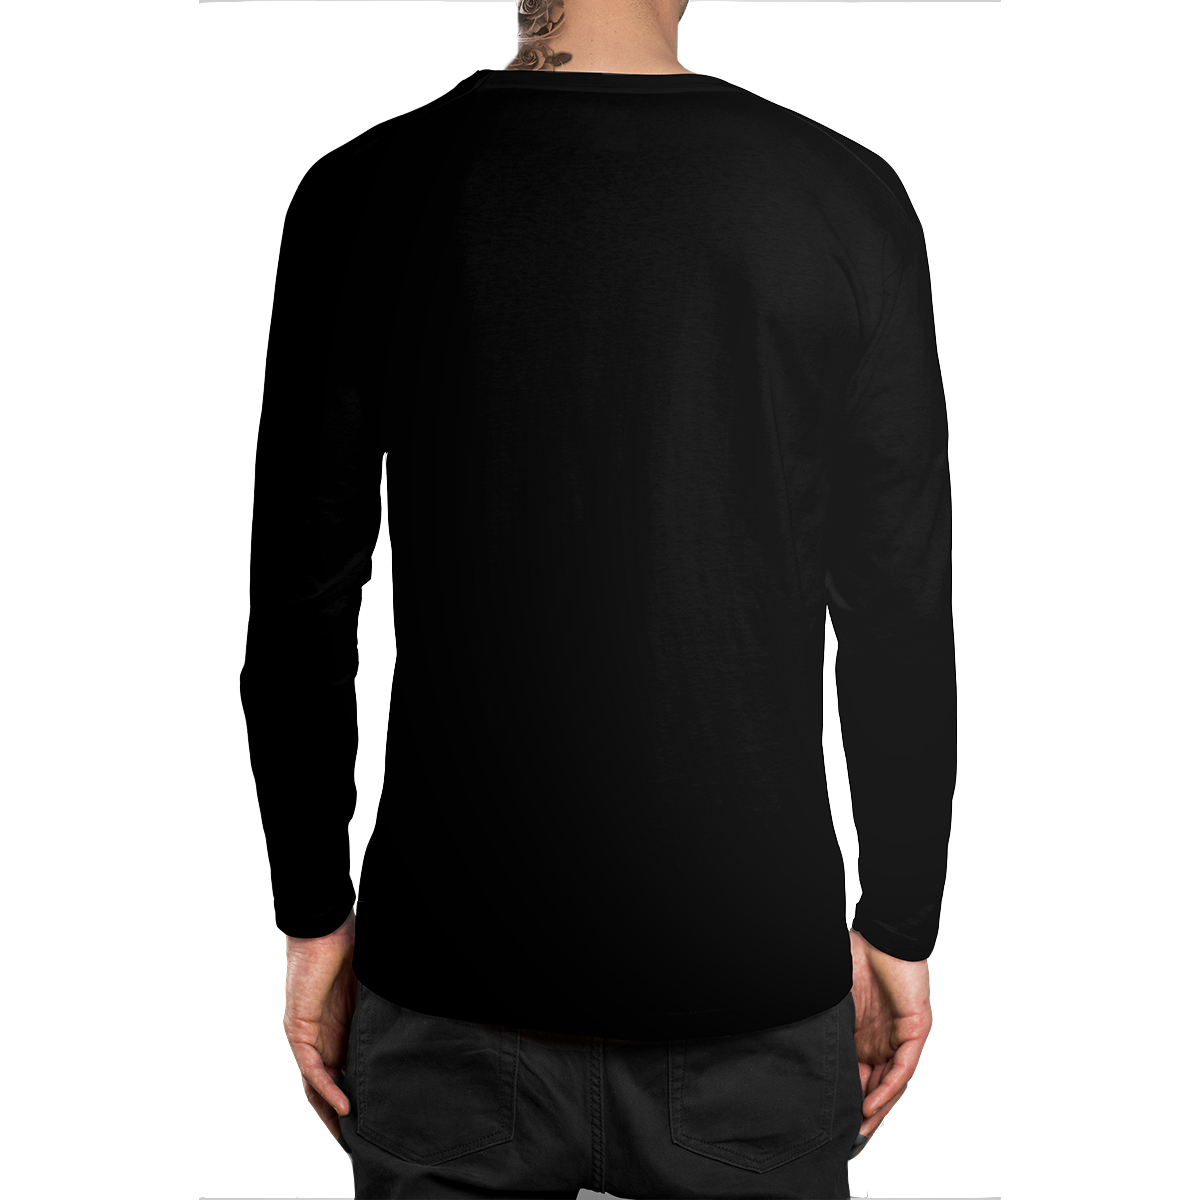 Stompy Camiseta Manga Longa Modelo 19